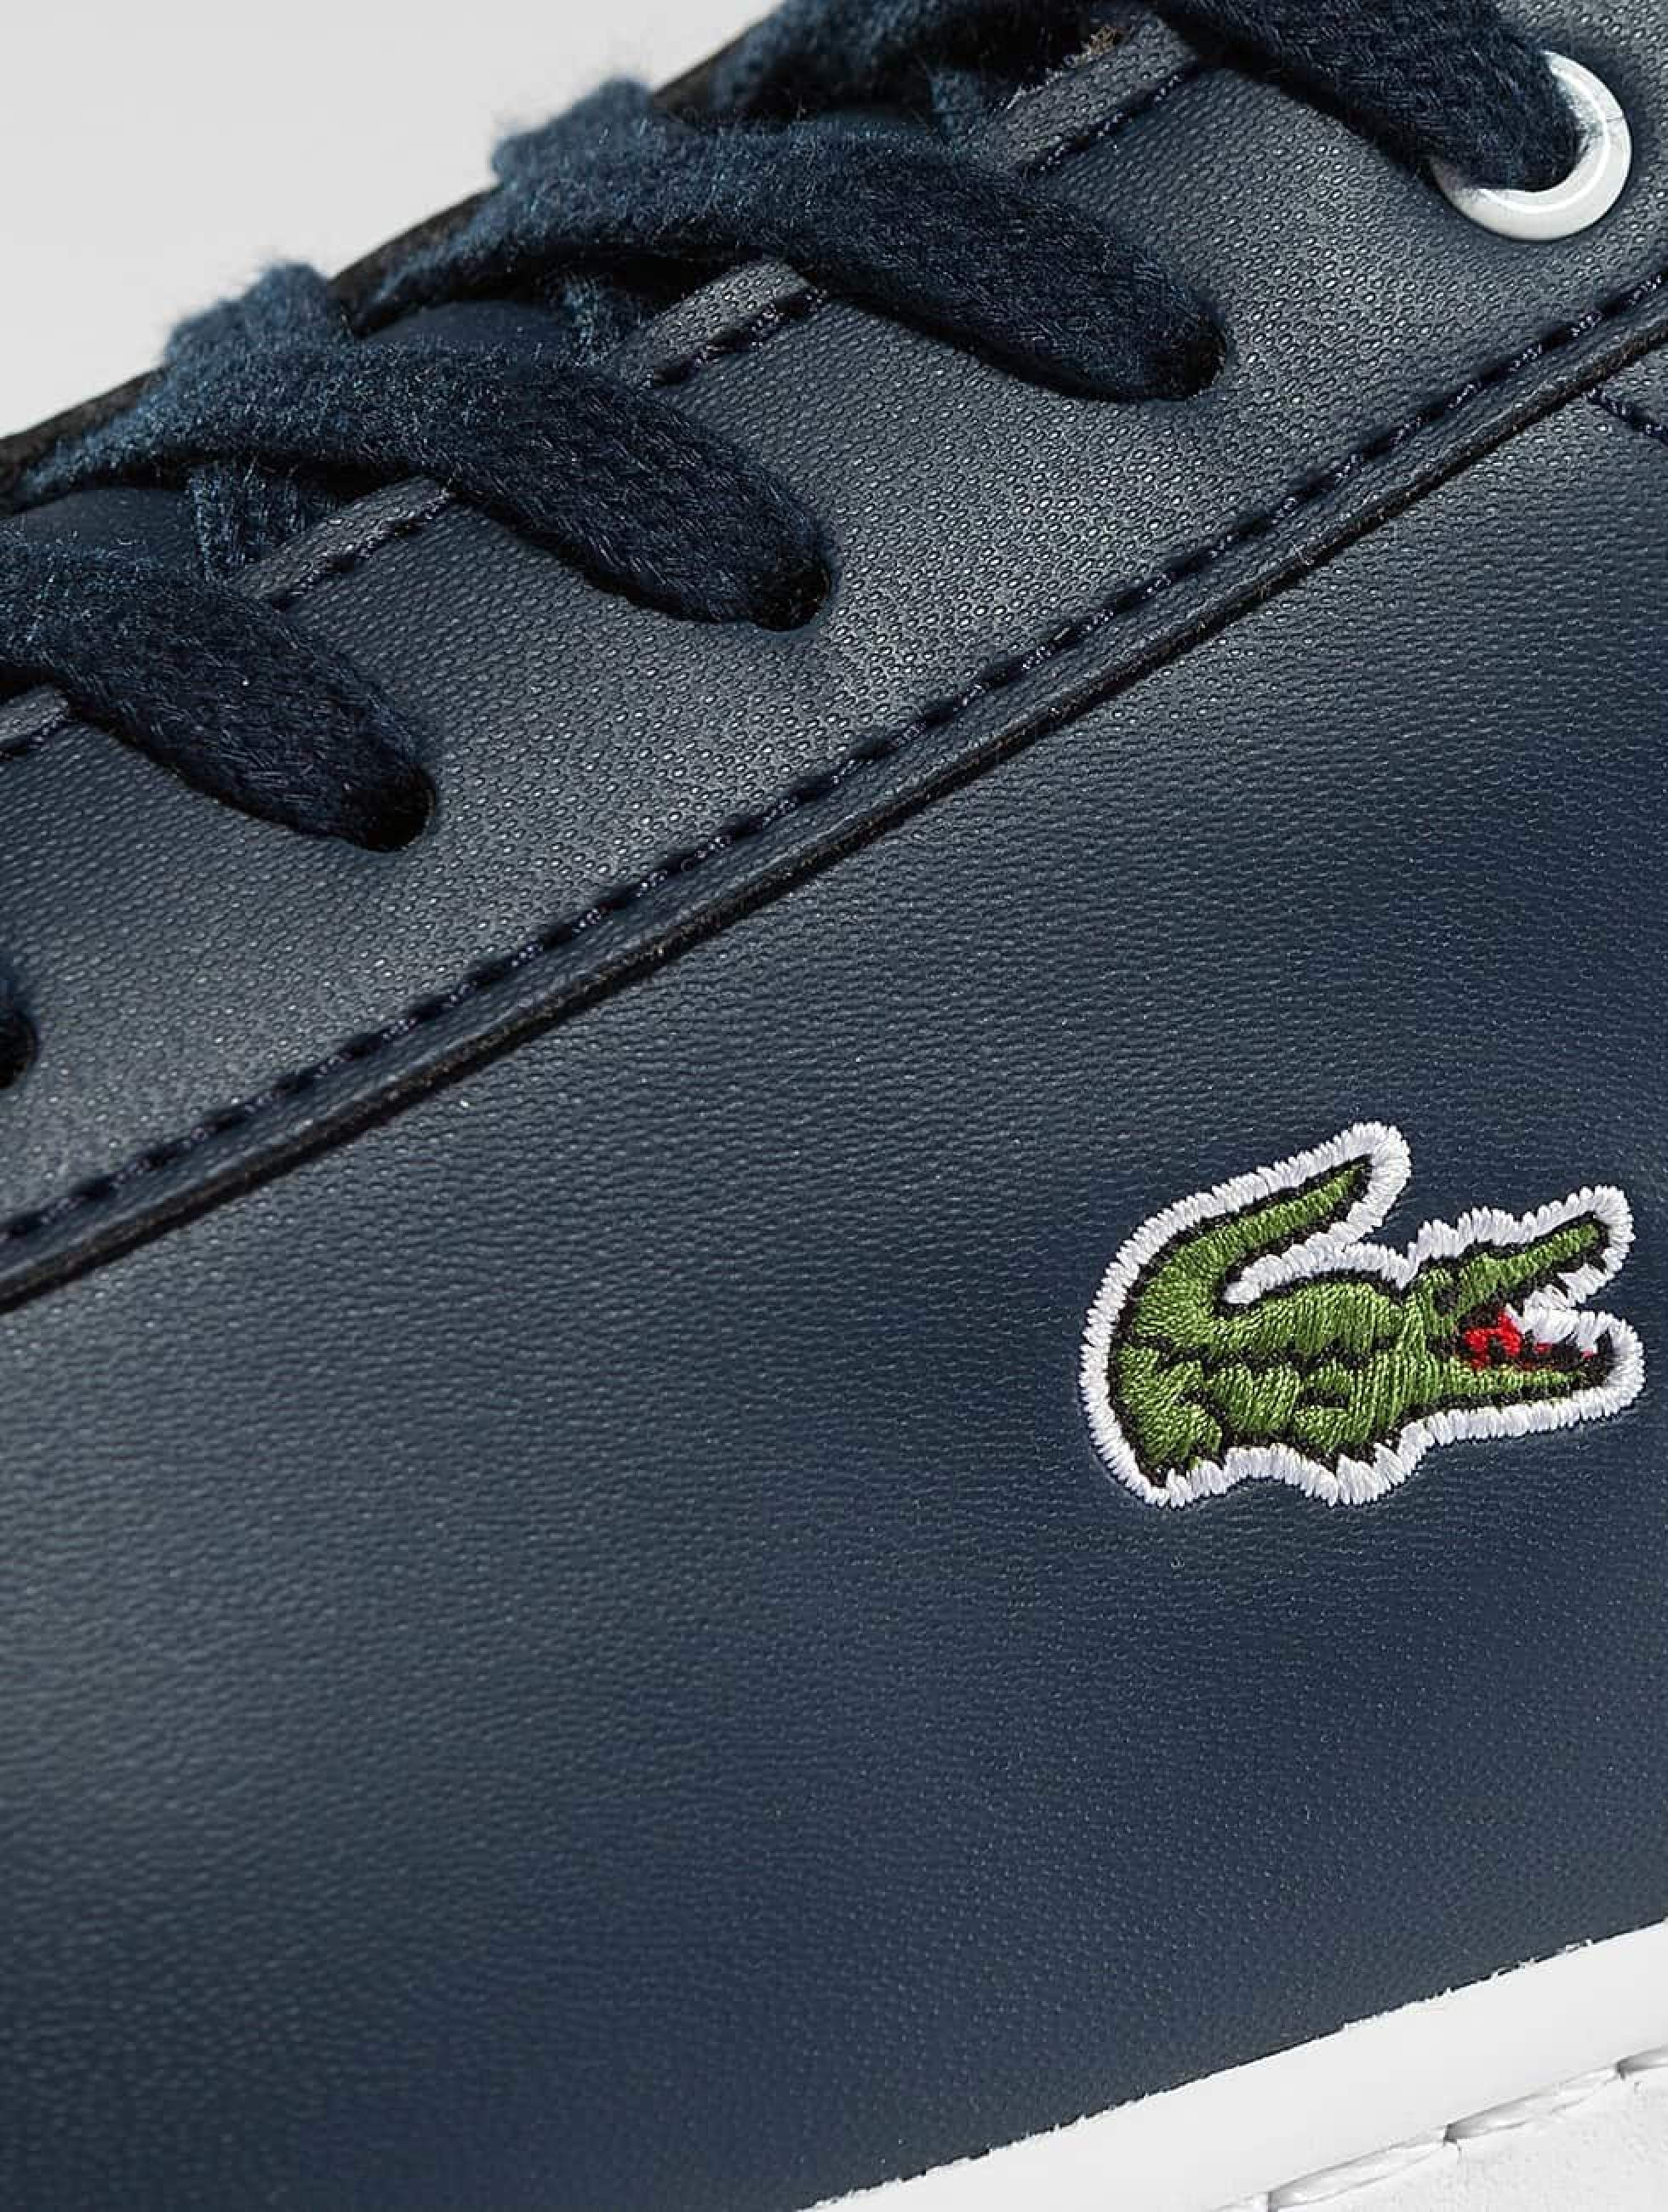 finest selection 4a1e7 8fb76 ... Nike Bruin Milieu chaussures chaussures chaussures de sport hautes baskets  homme en cuir daim bleu 3a0233 ...